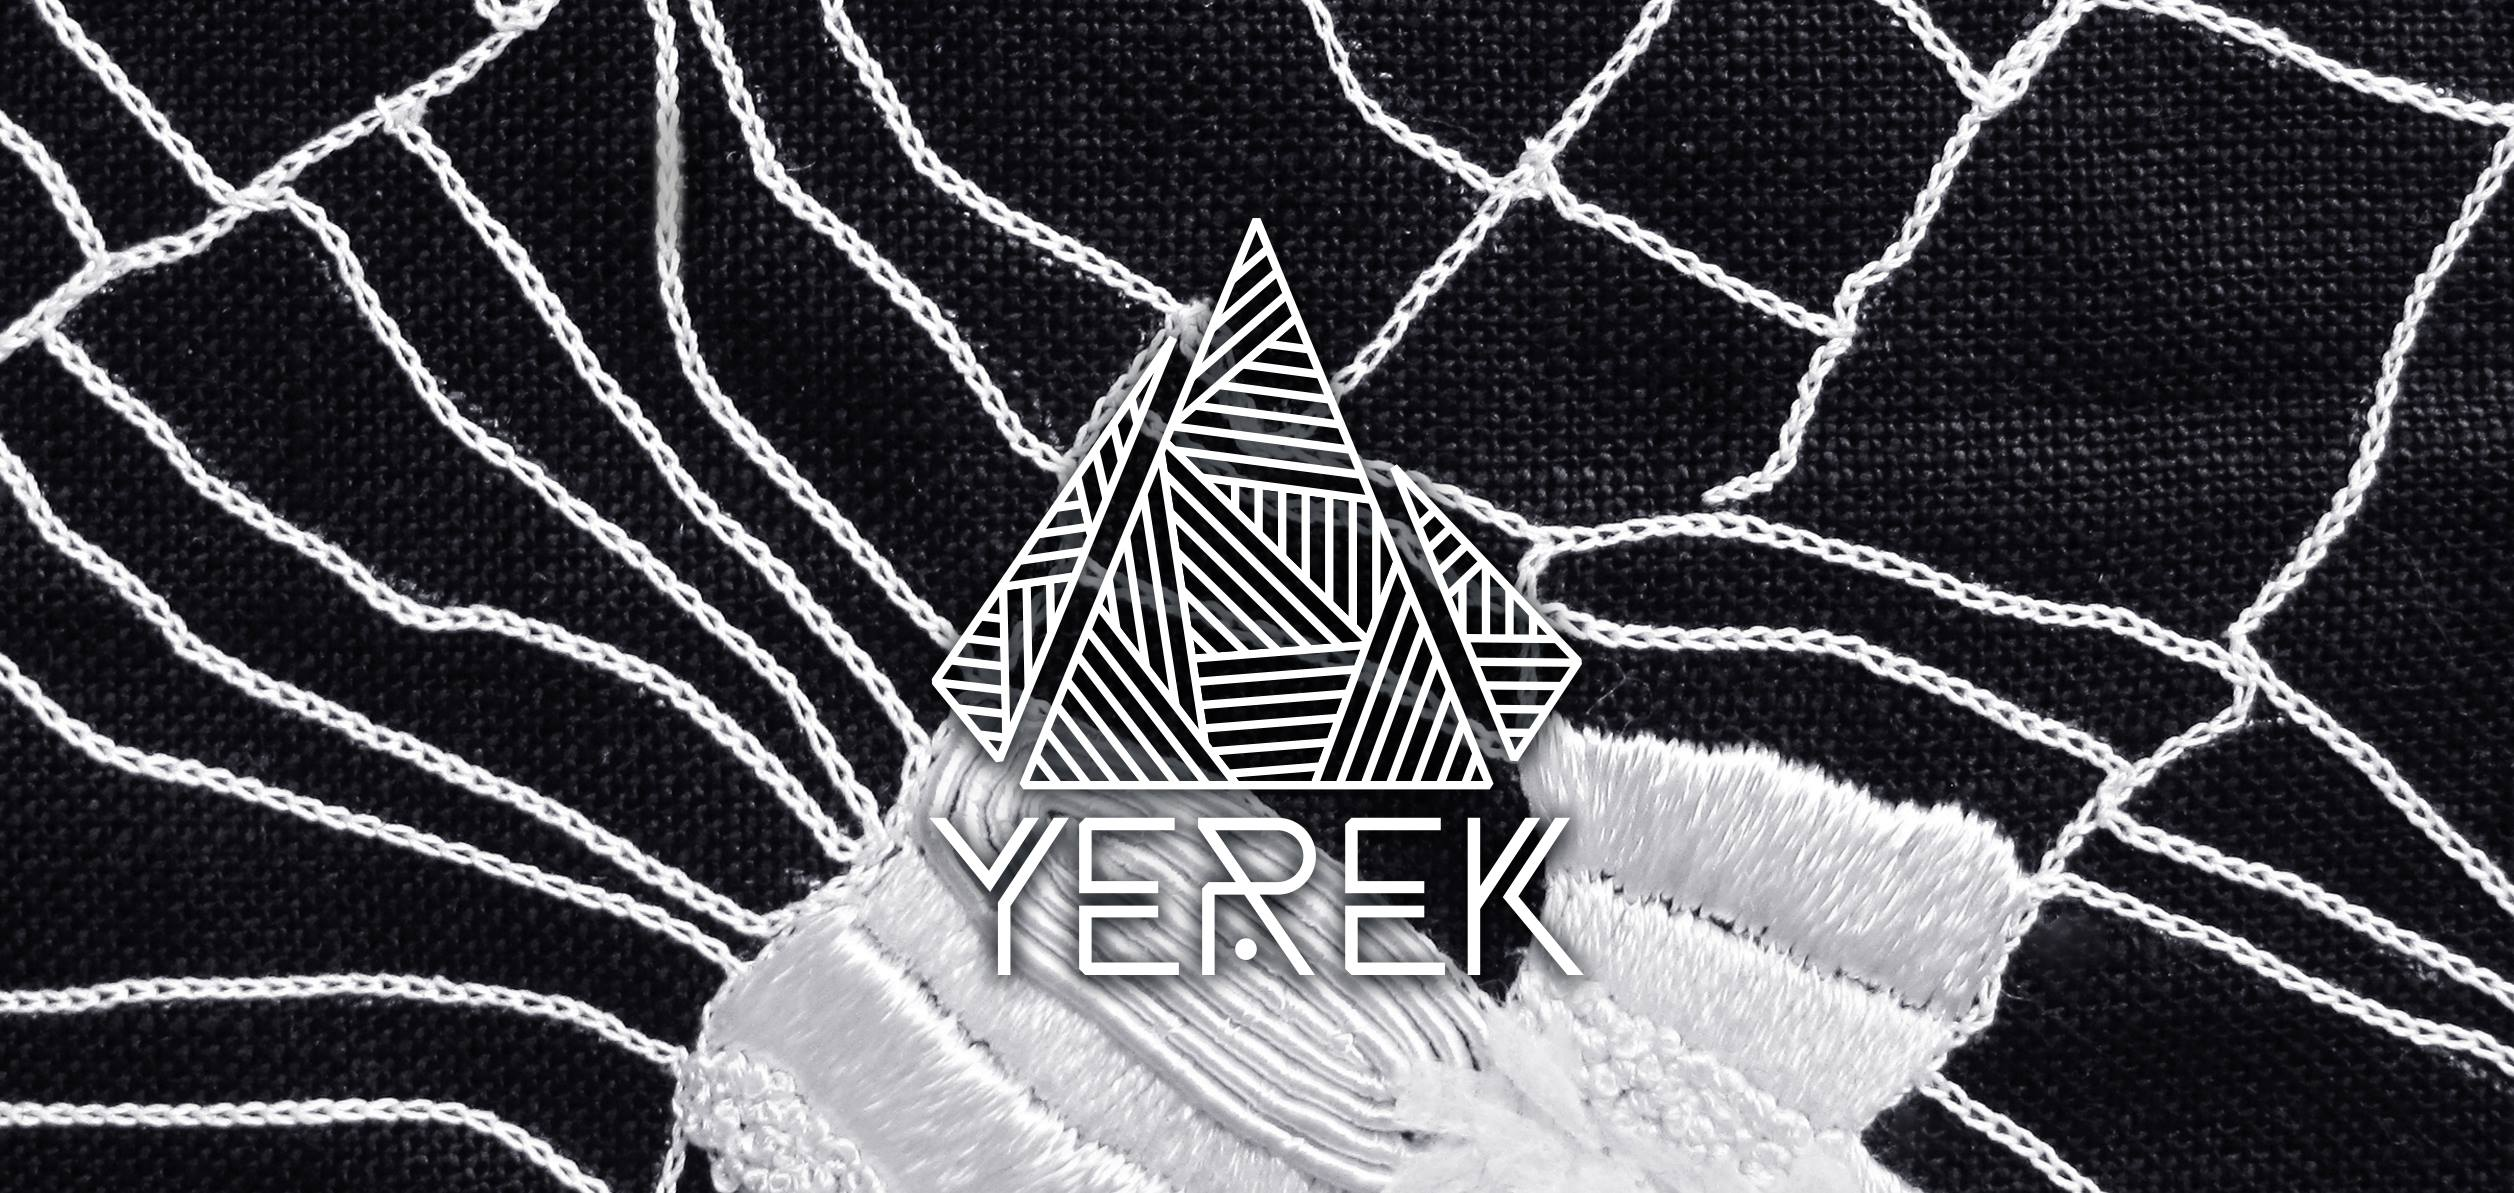 Yerek ou l'aventure de Sin